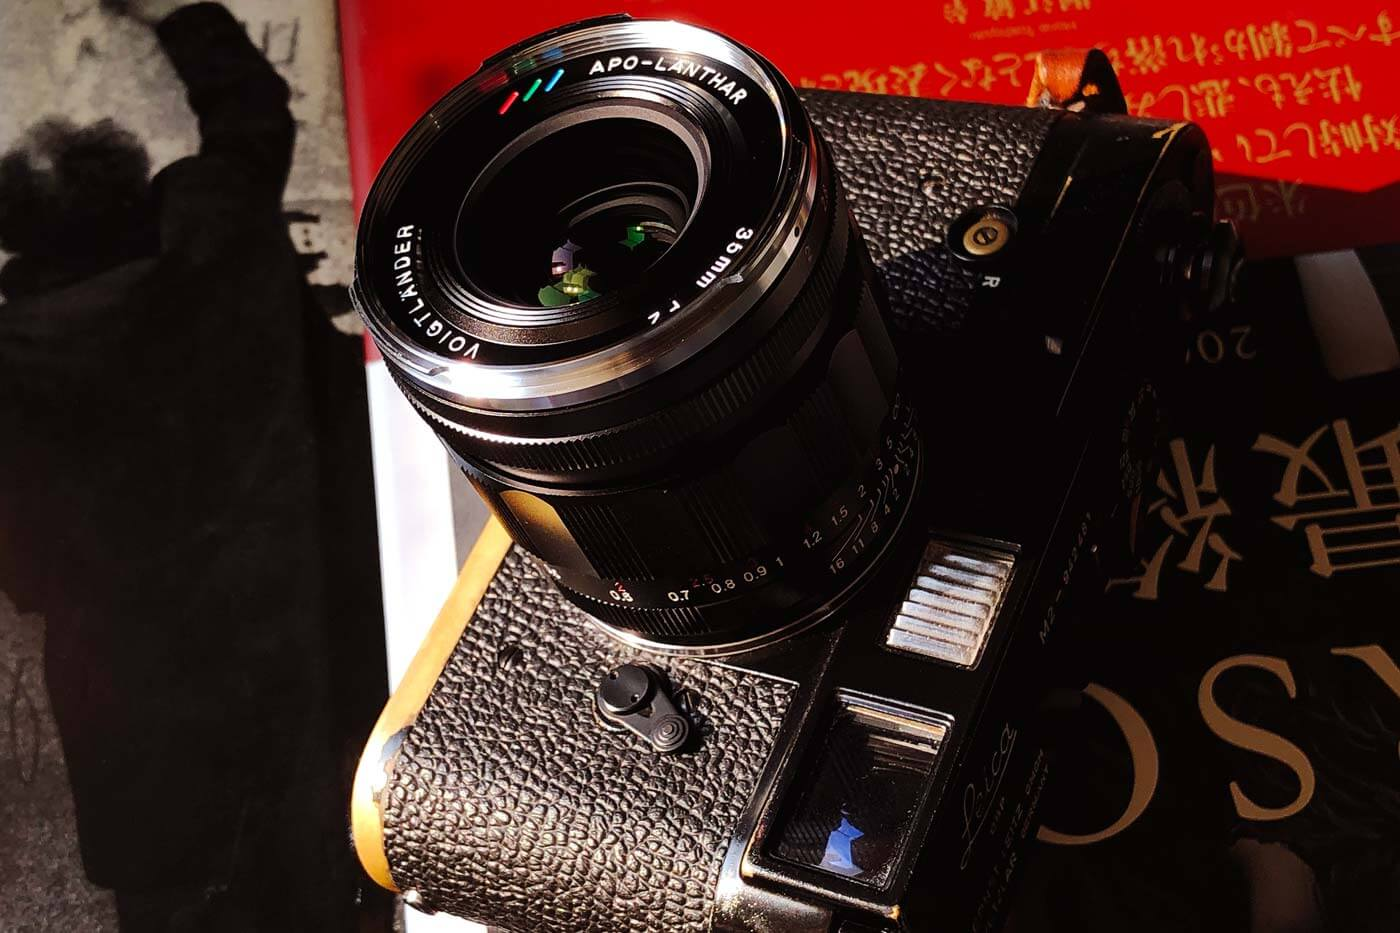 Voigtlander-APO-lanthar-apochromatic-refined-asph-35mm-f2-wide-angle-vm-m-mount-lens-review-barrel-design-logo